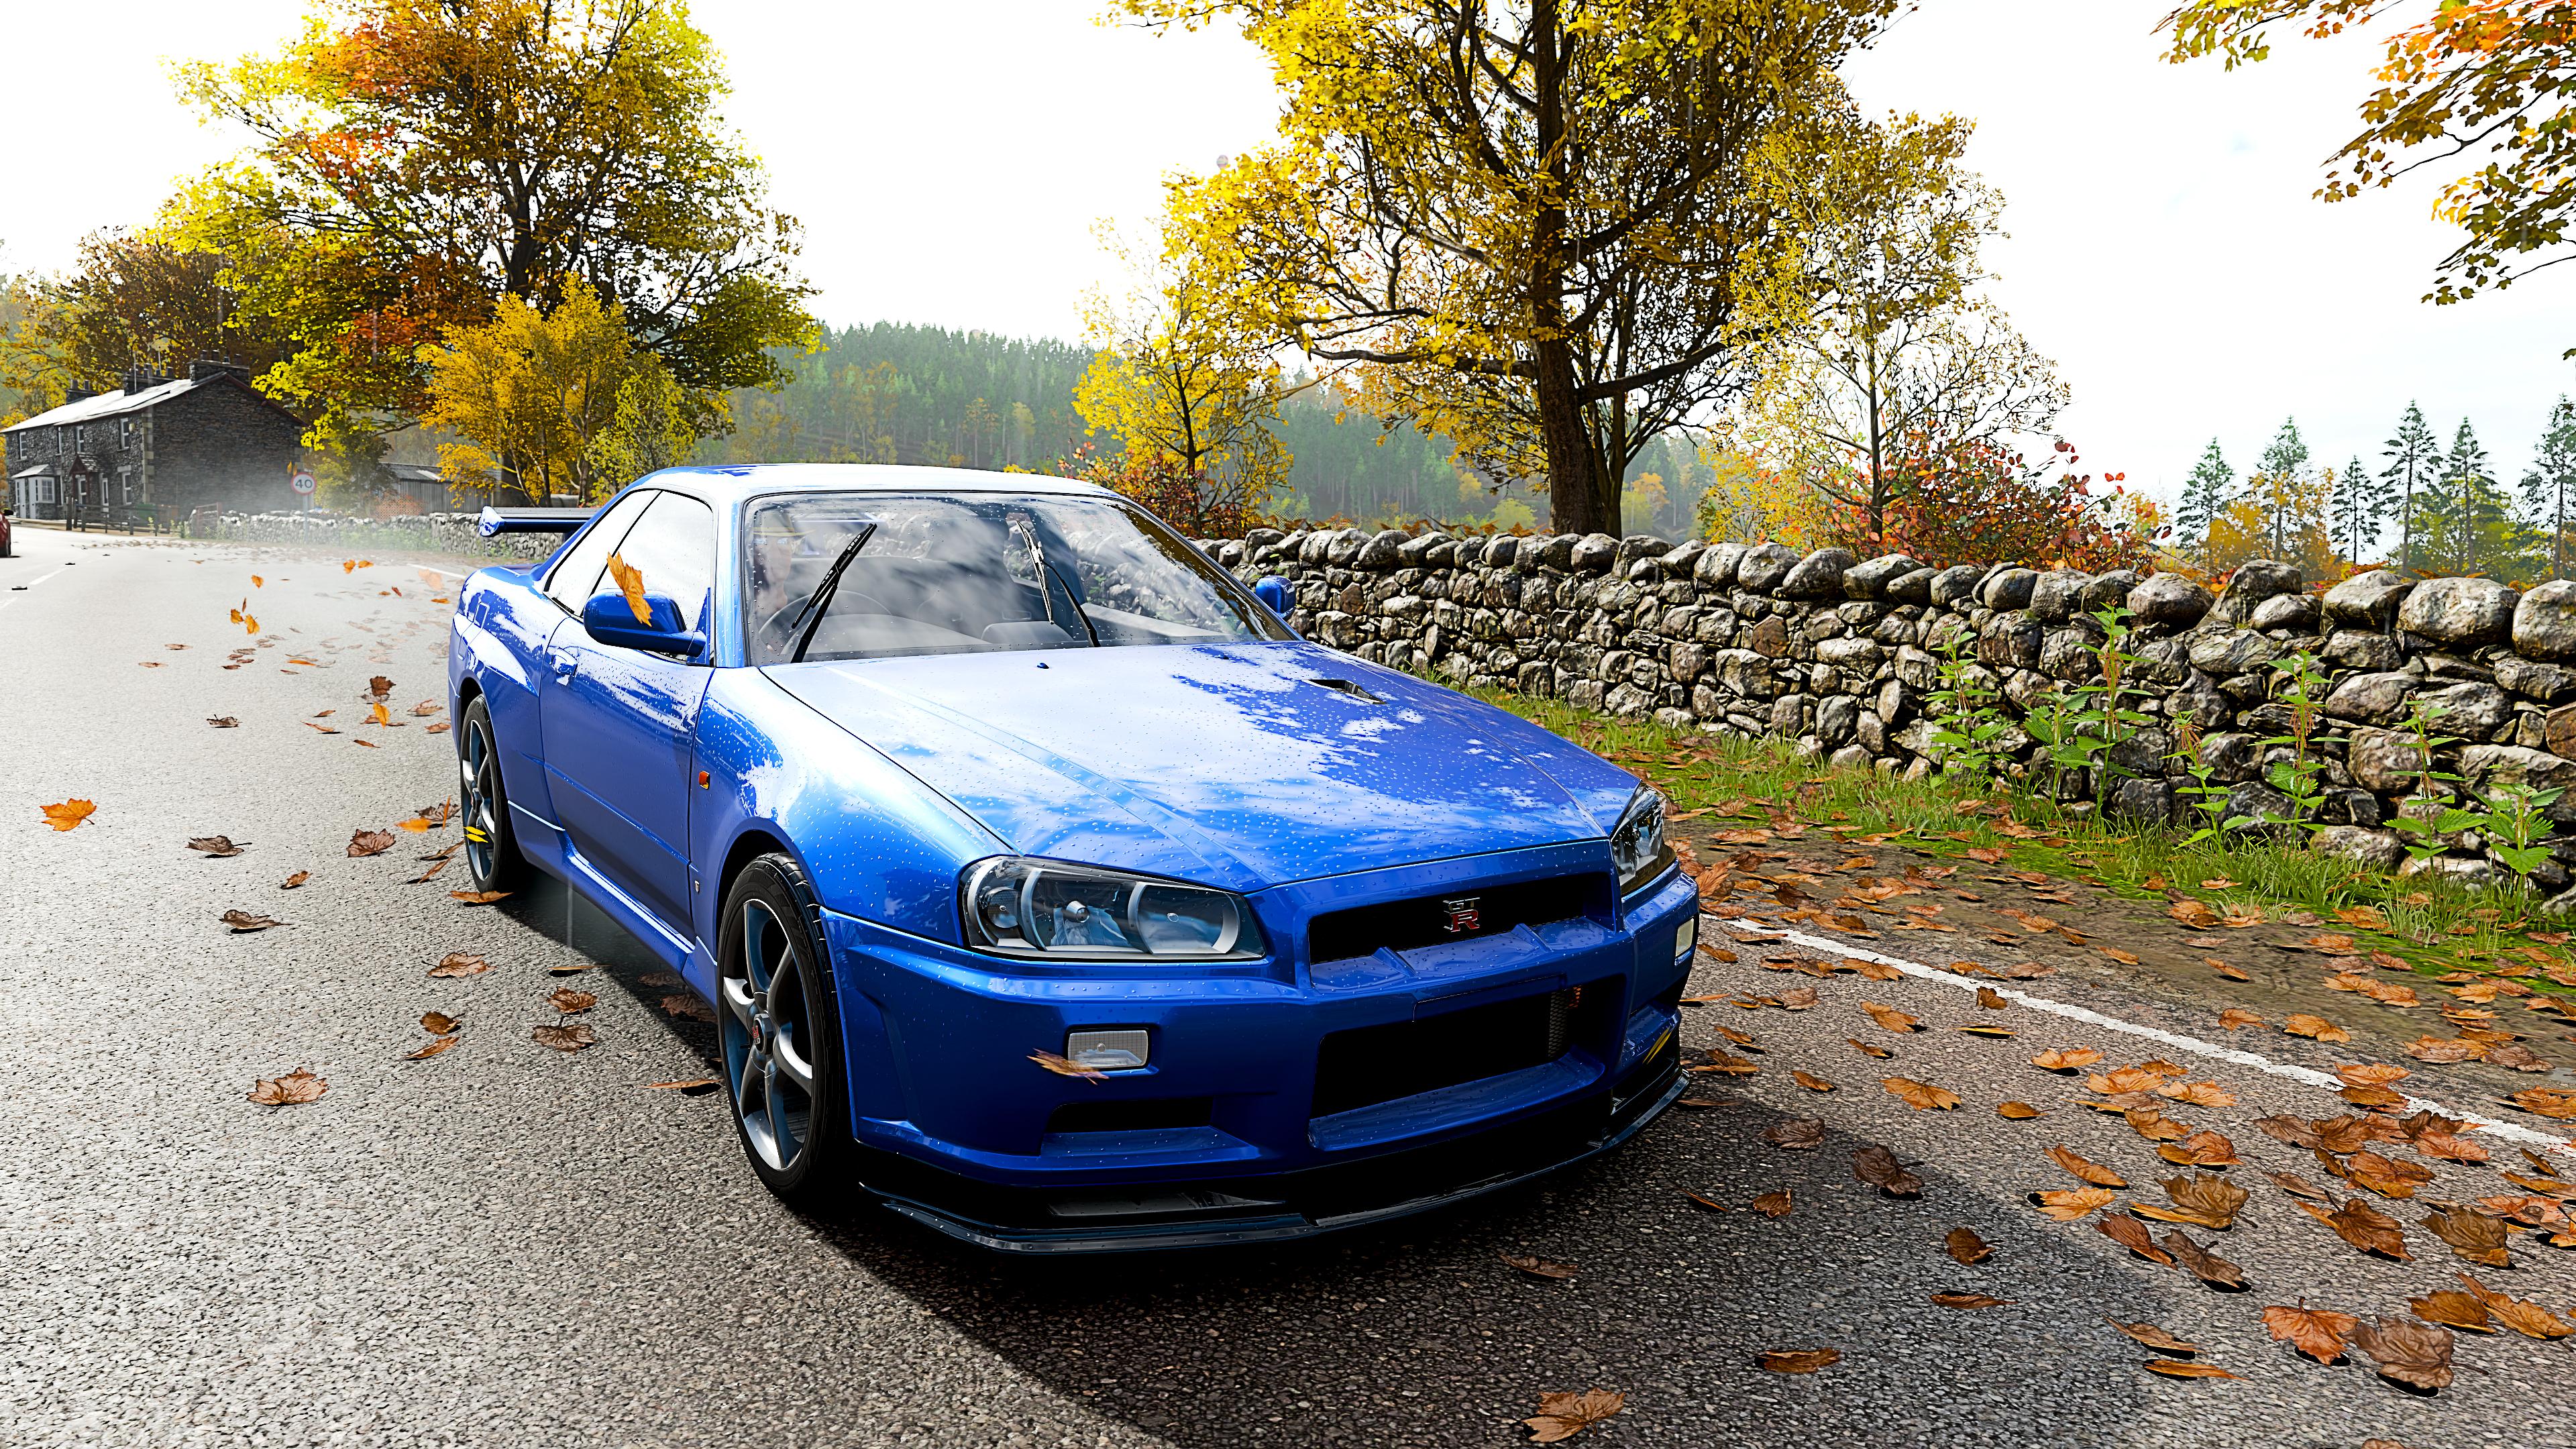 General 3840x2160 Forza Horizon 4 spring car blue cars Skyline R34